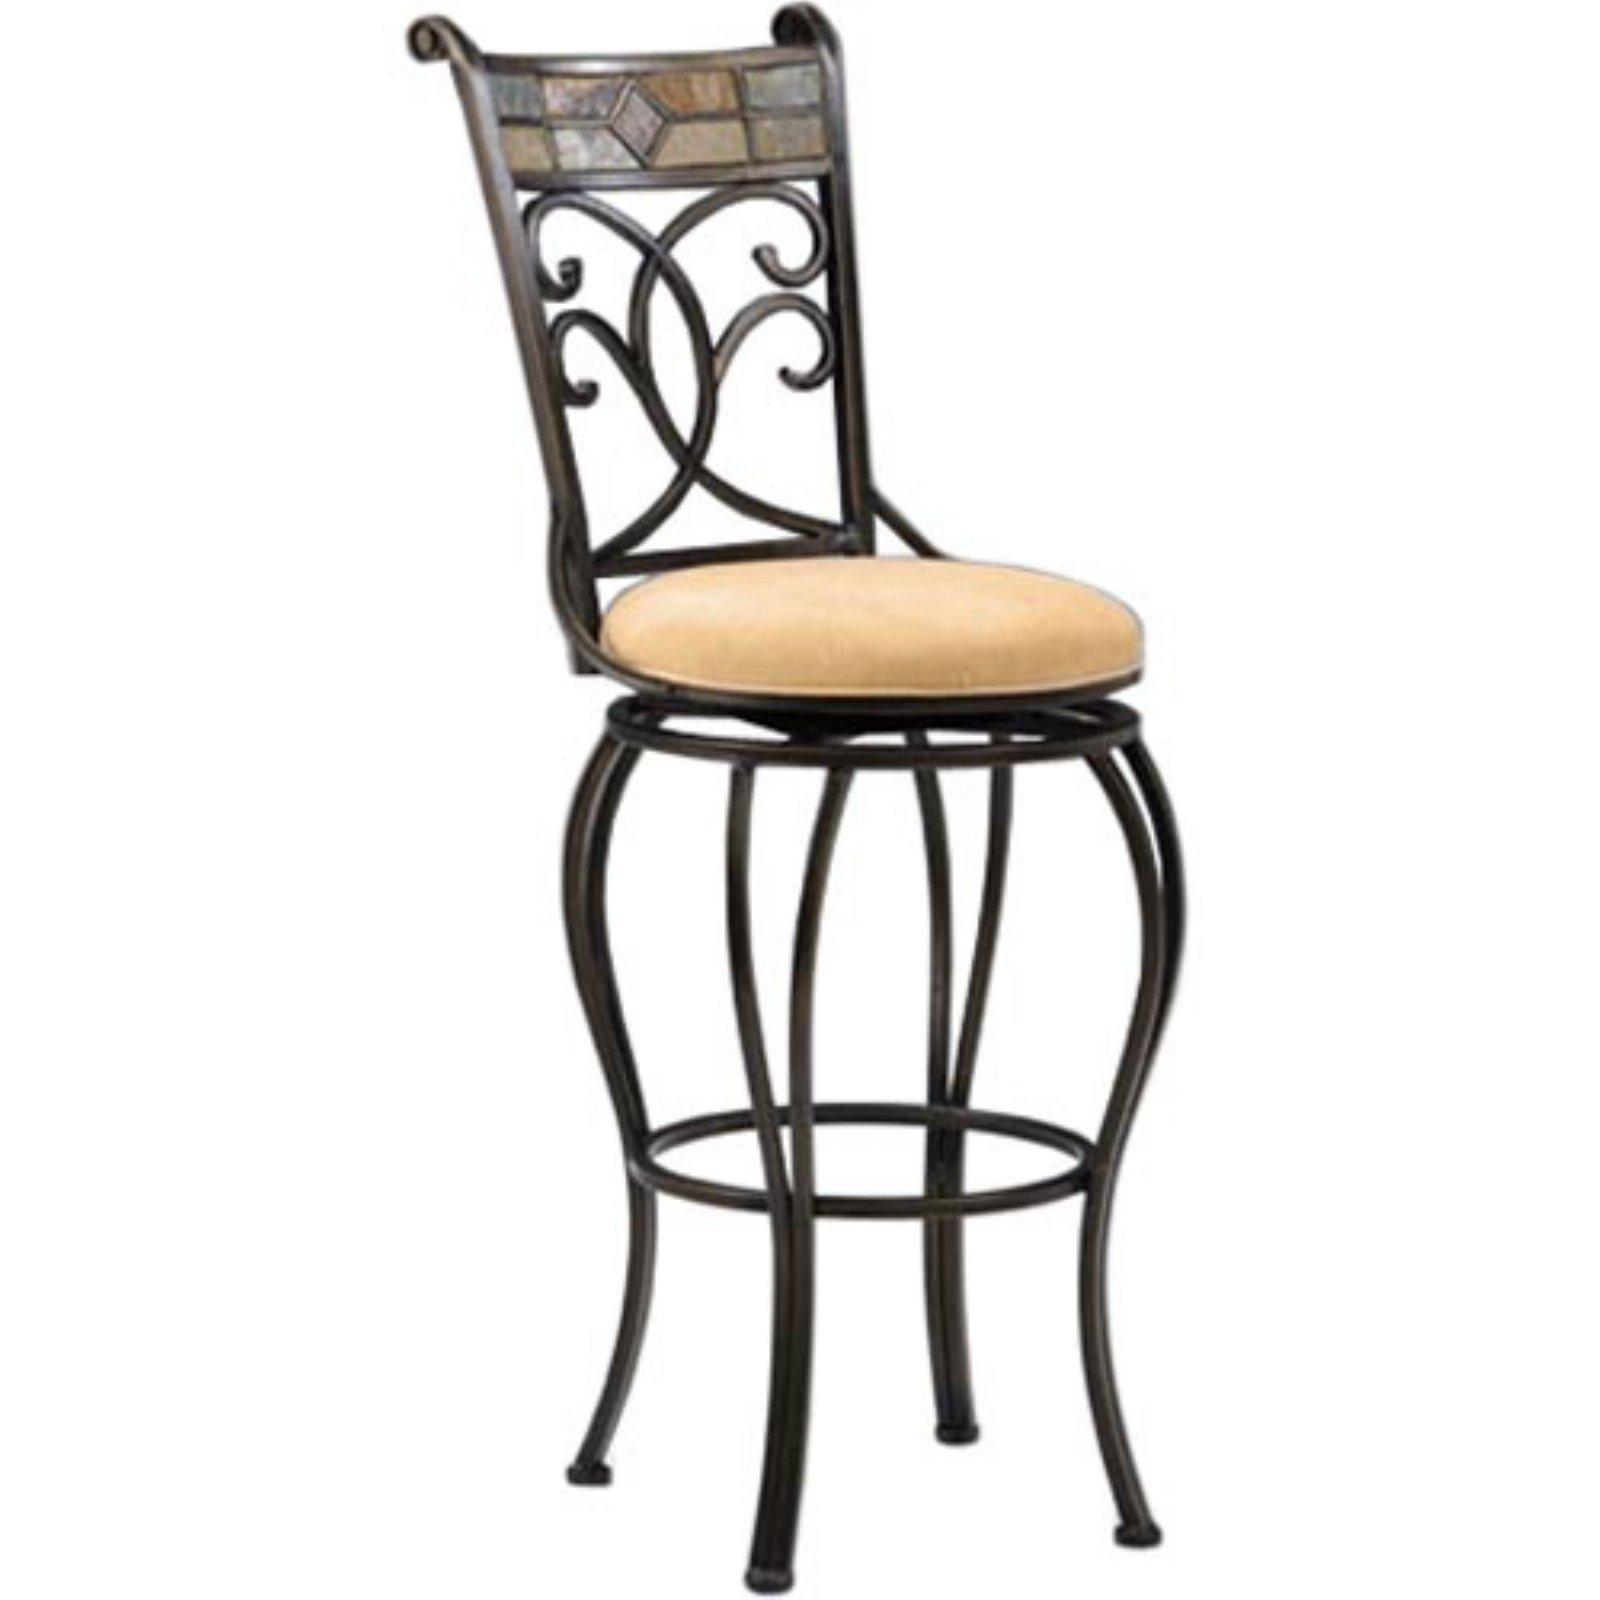 Hillsdale Pompei 30 in. Swivel Bar Stool Black Gold by Hillsdale Furniture